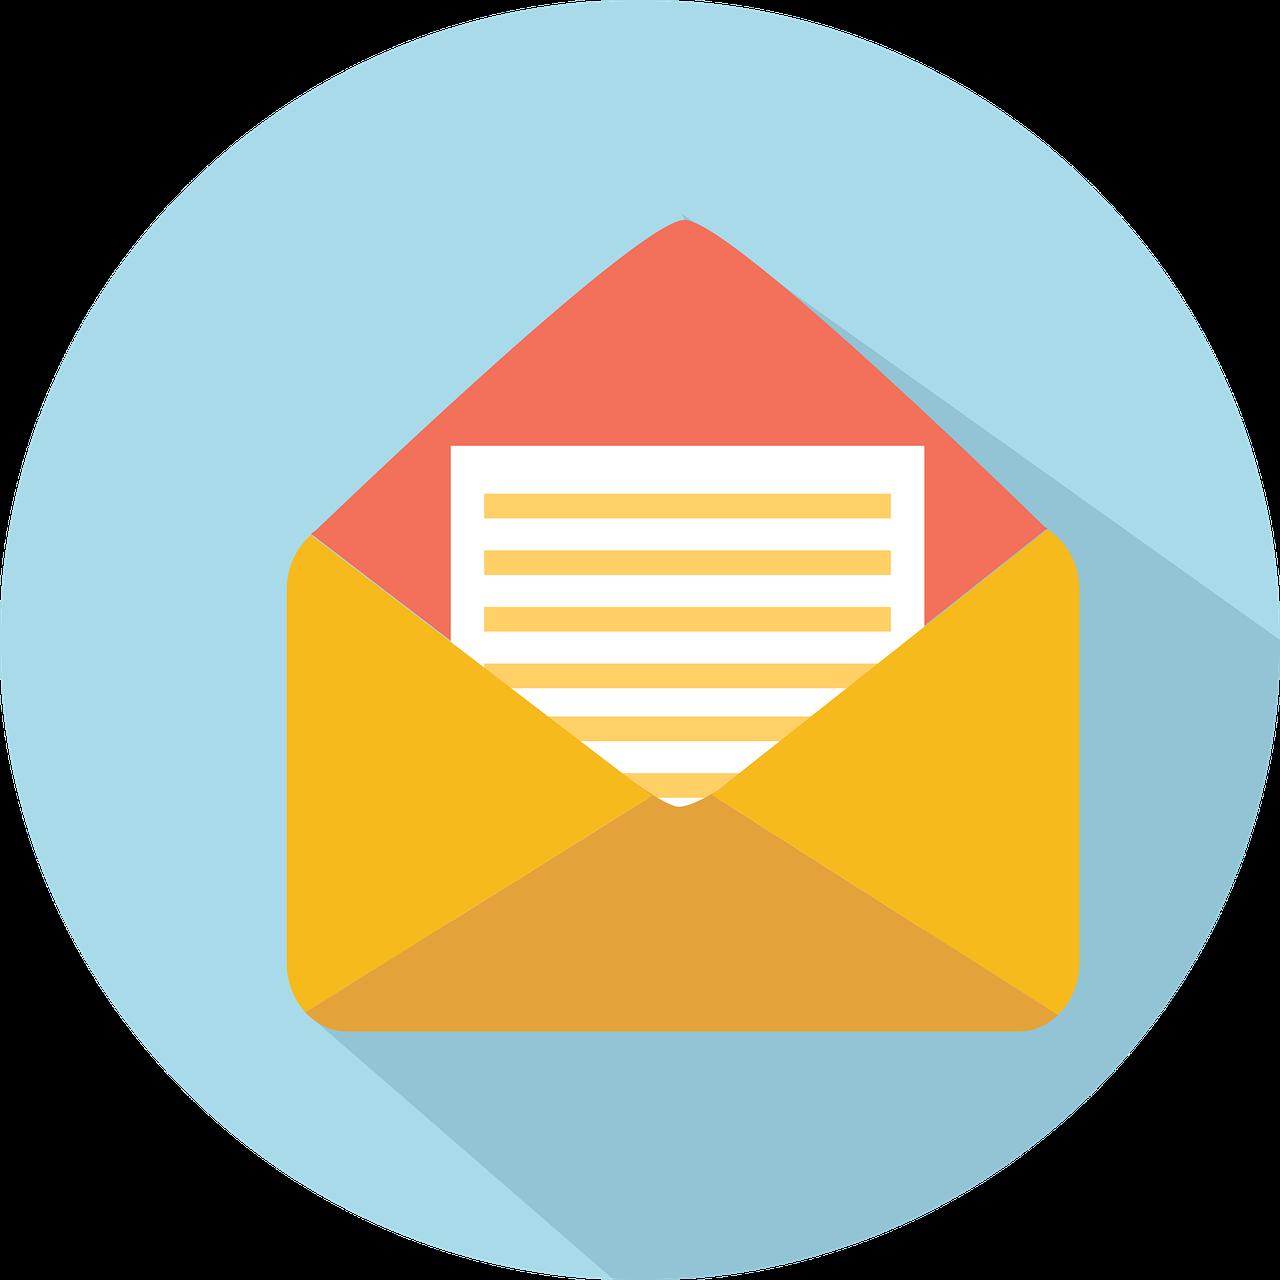 envelope-4313721_1280